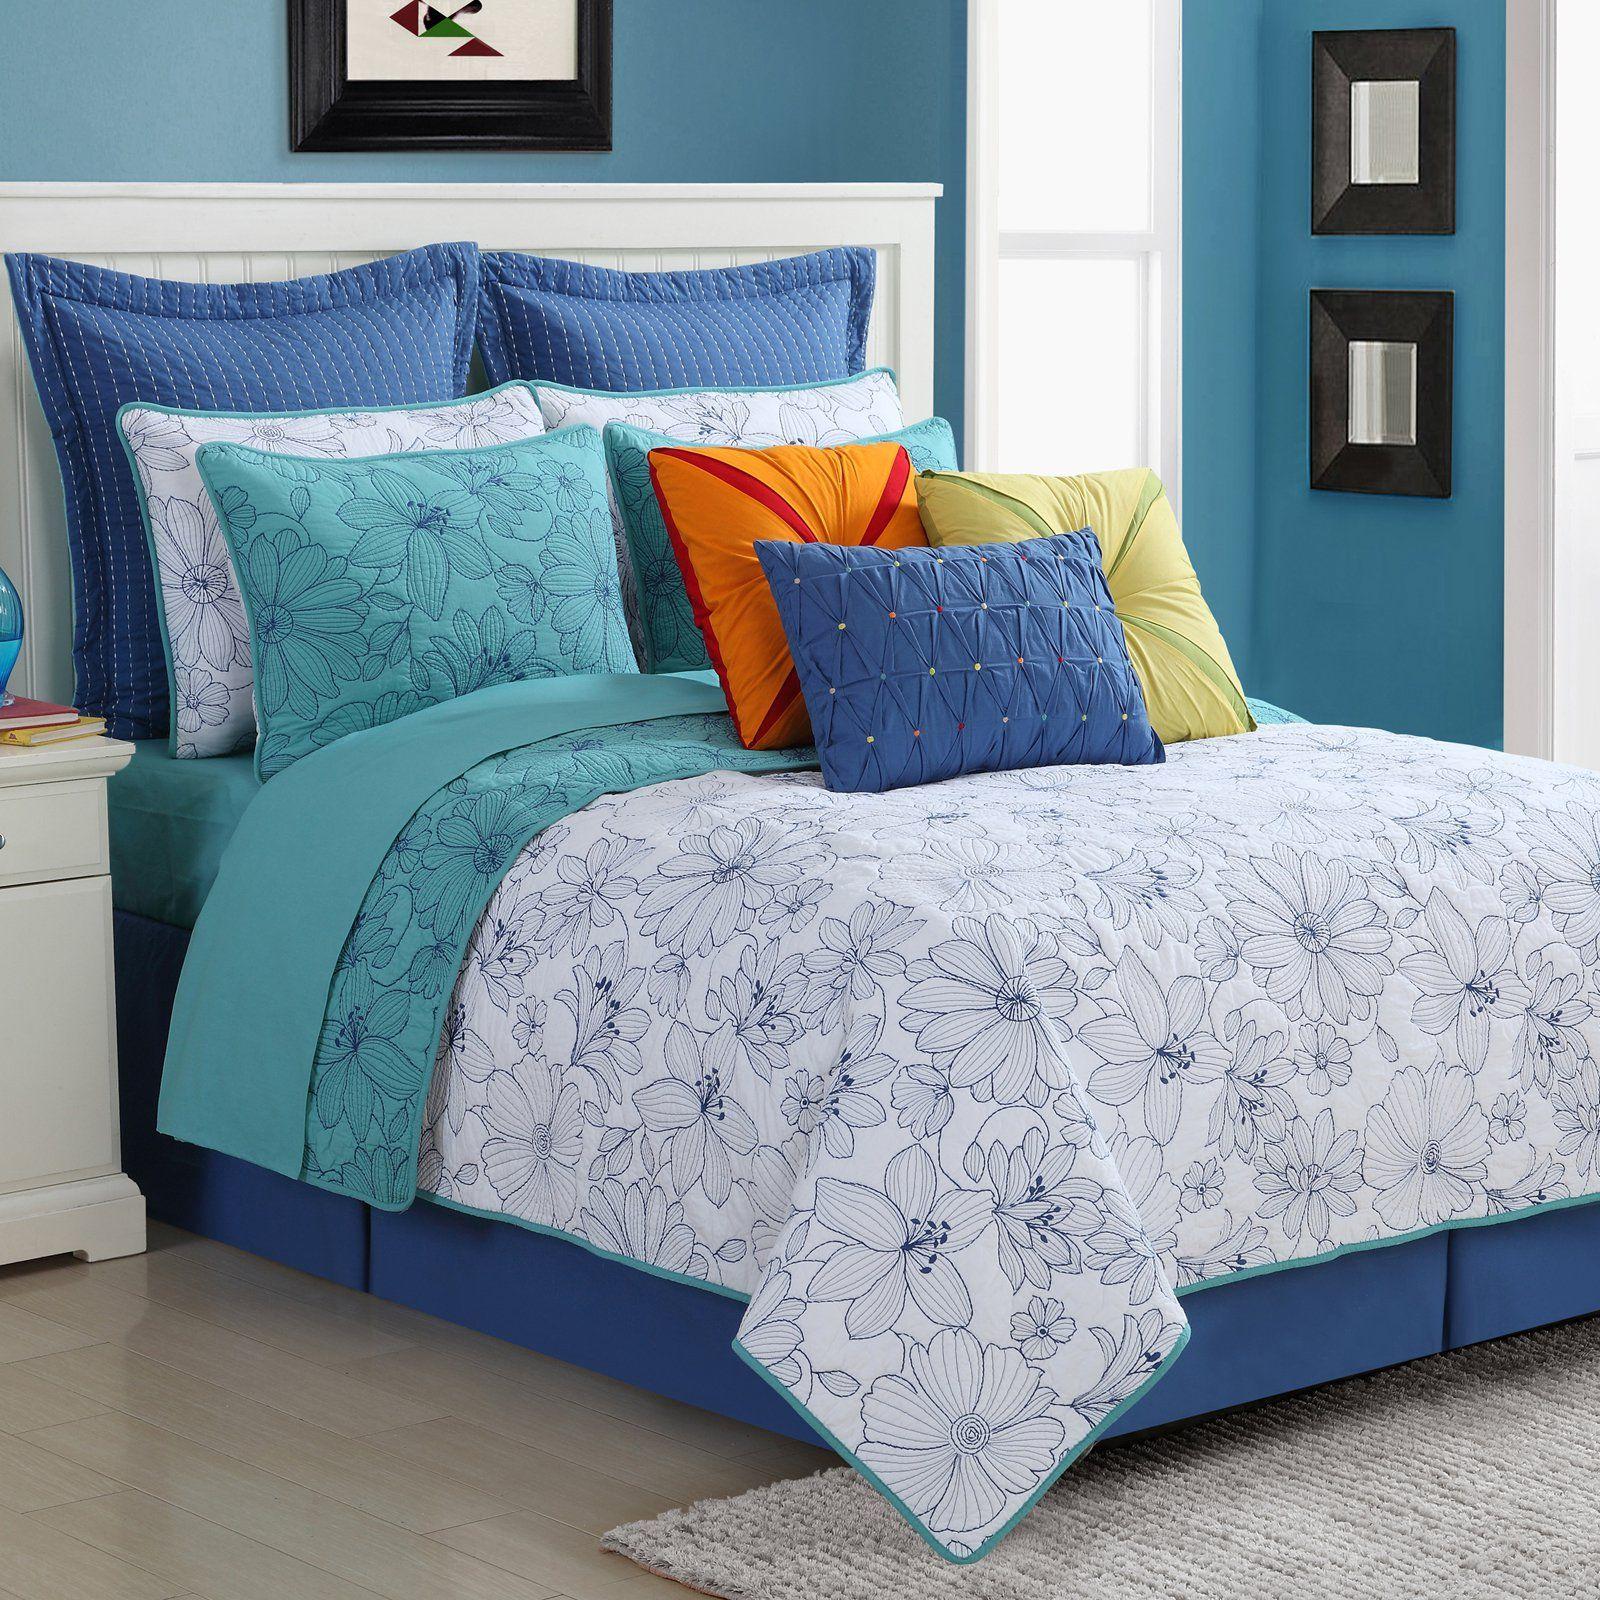 Dash Reversible 140TC Cotton Quilt Set by Fiesta Bedding